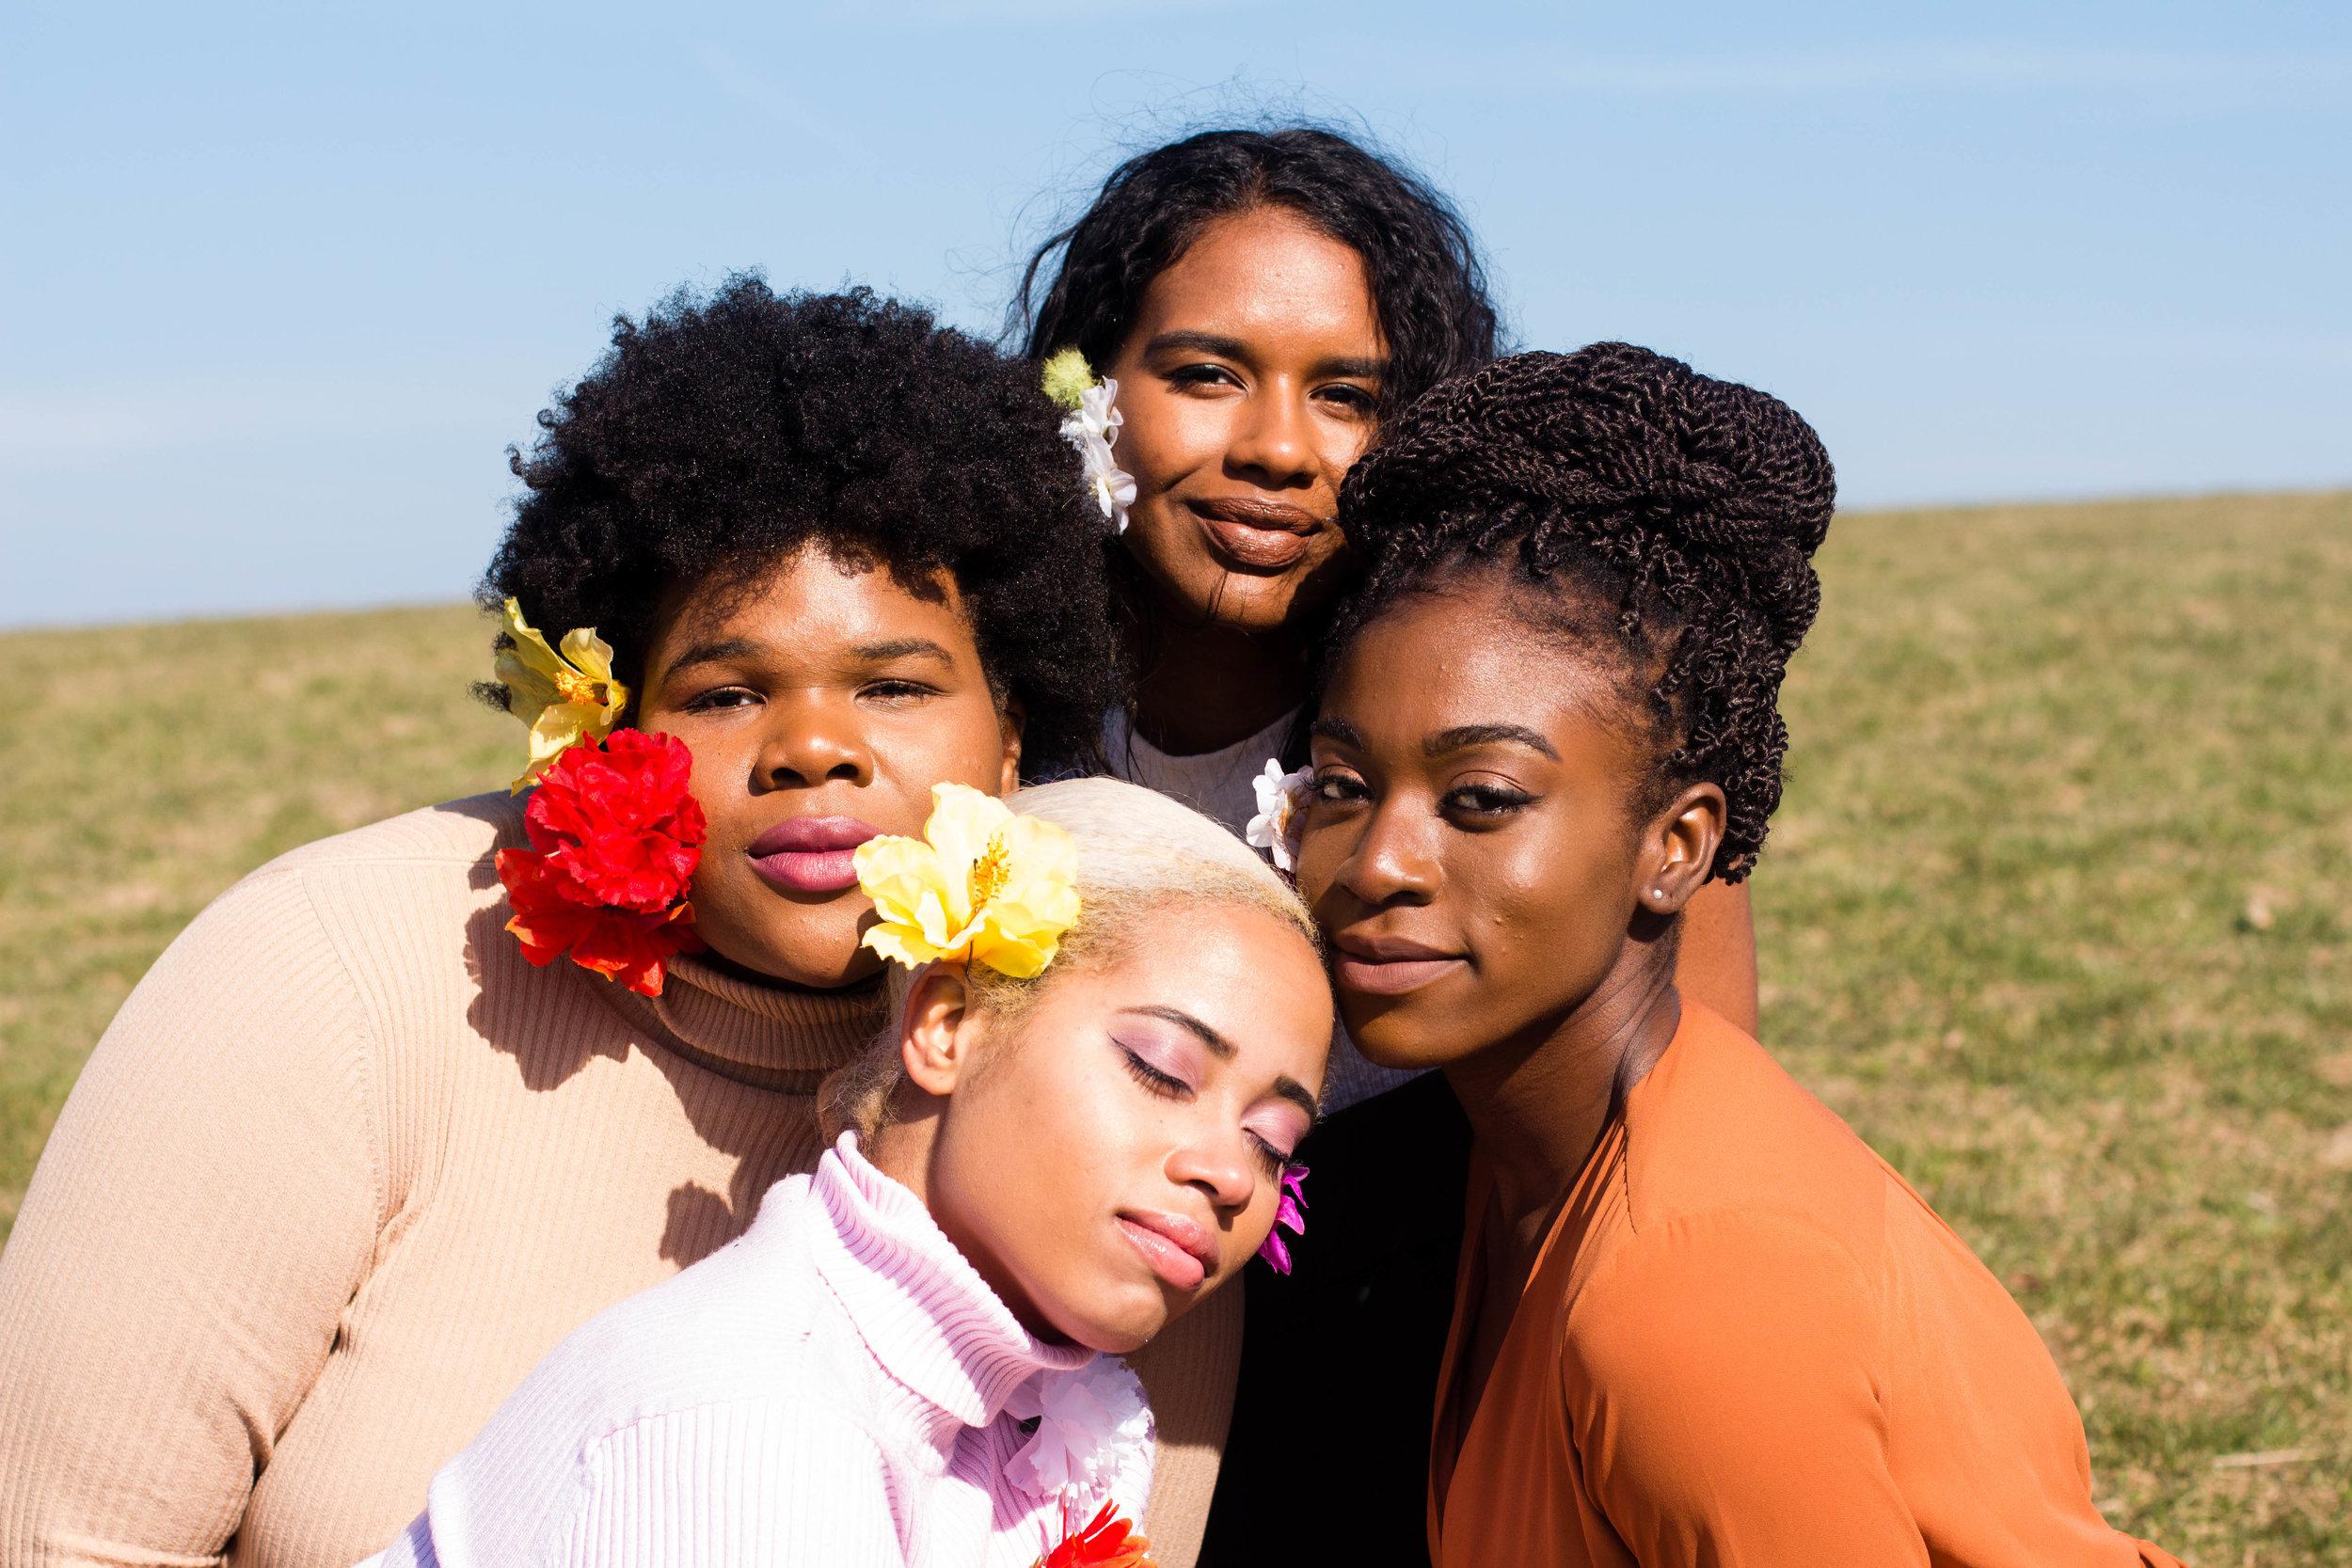 IREASHIA MONÉT Chicago, IL, USA  www.ireashiamonet.com   @ireashiamonet  //  @ireashiamonet